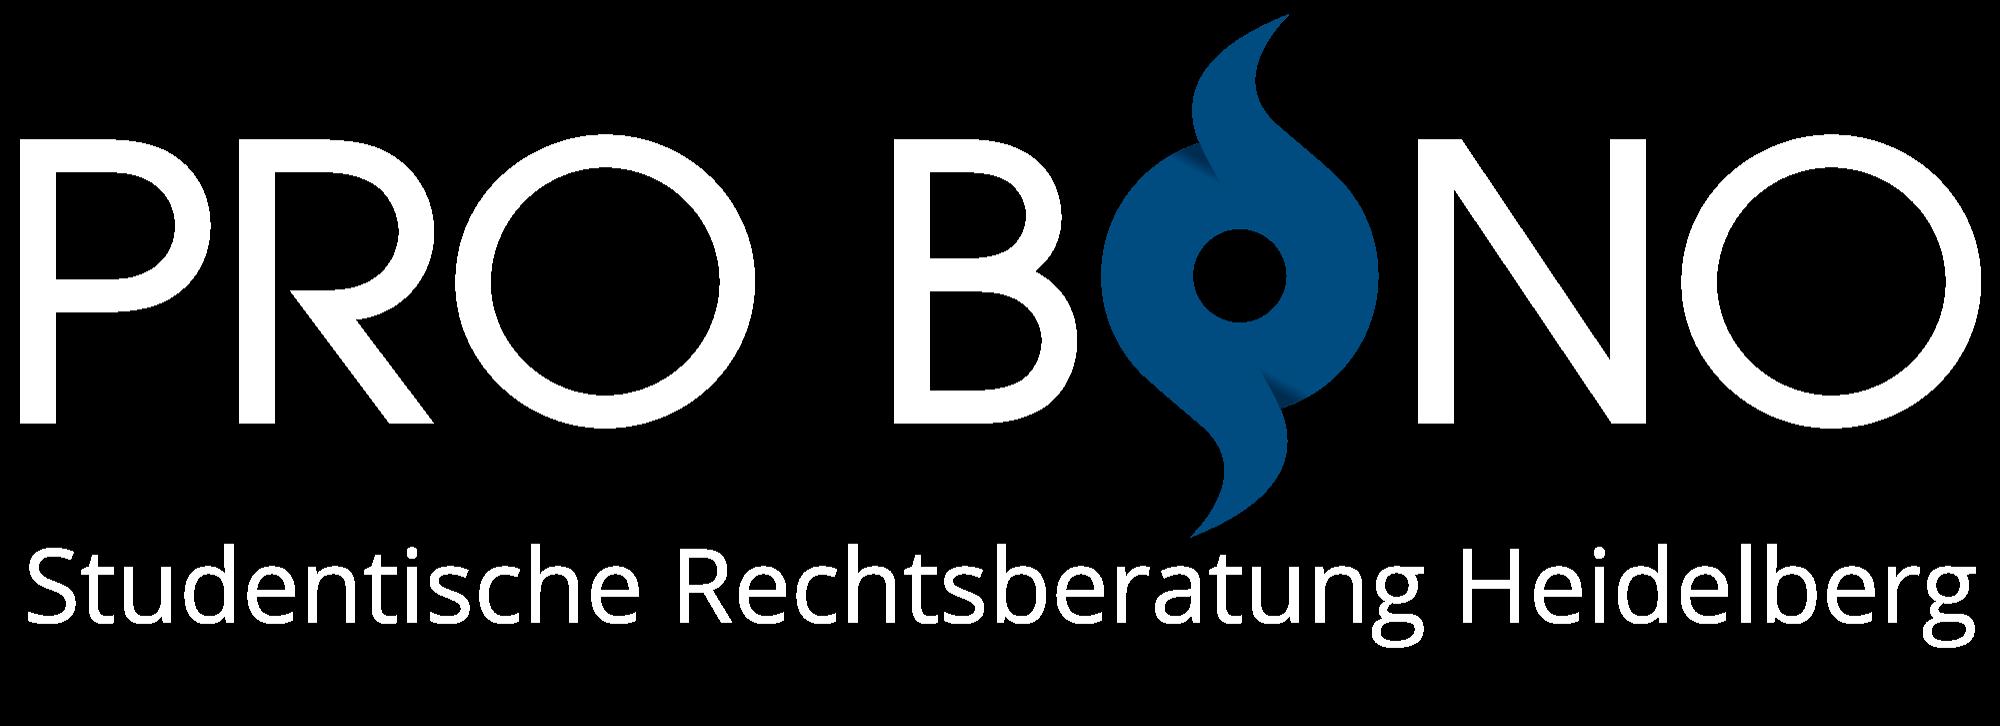 Pro Bono Heidelberg e.V.